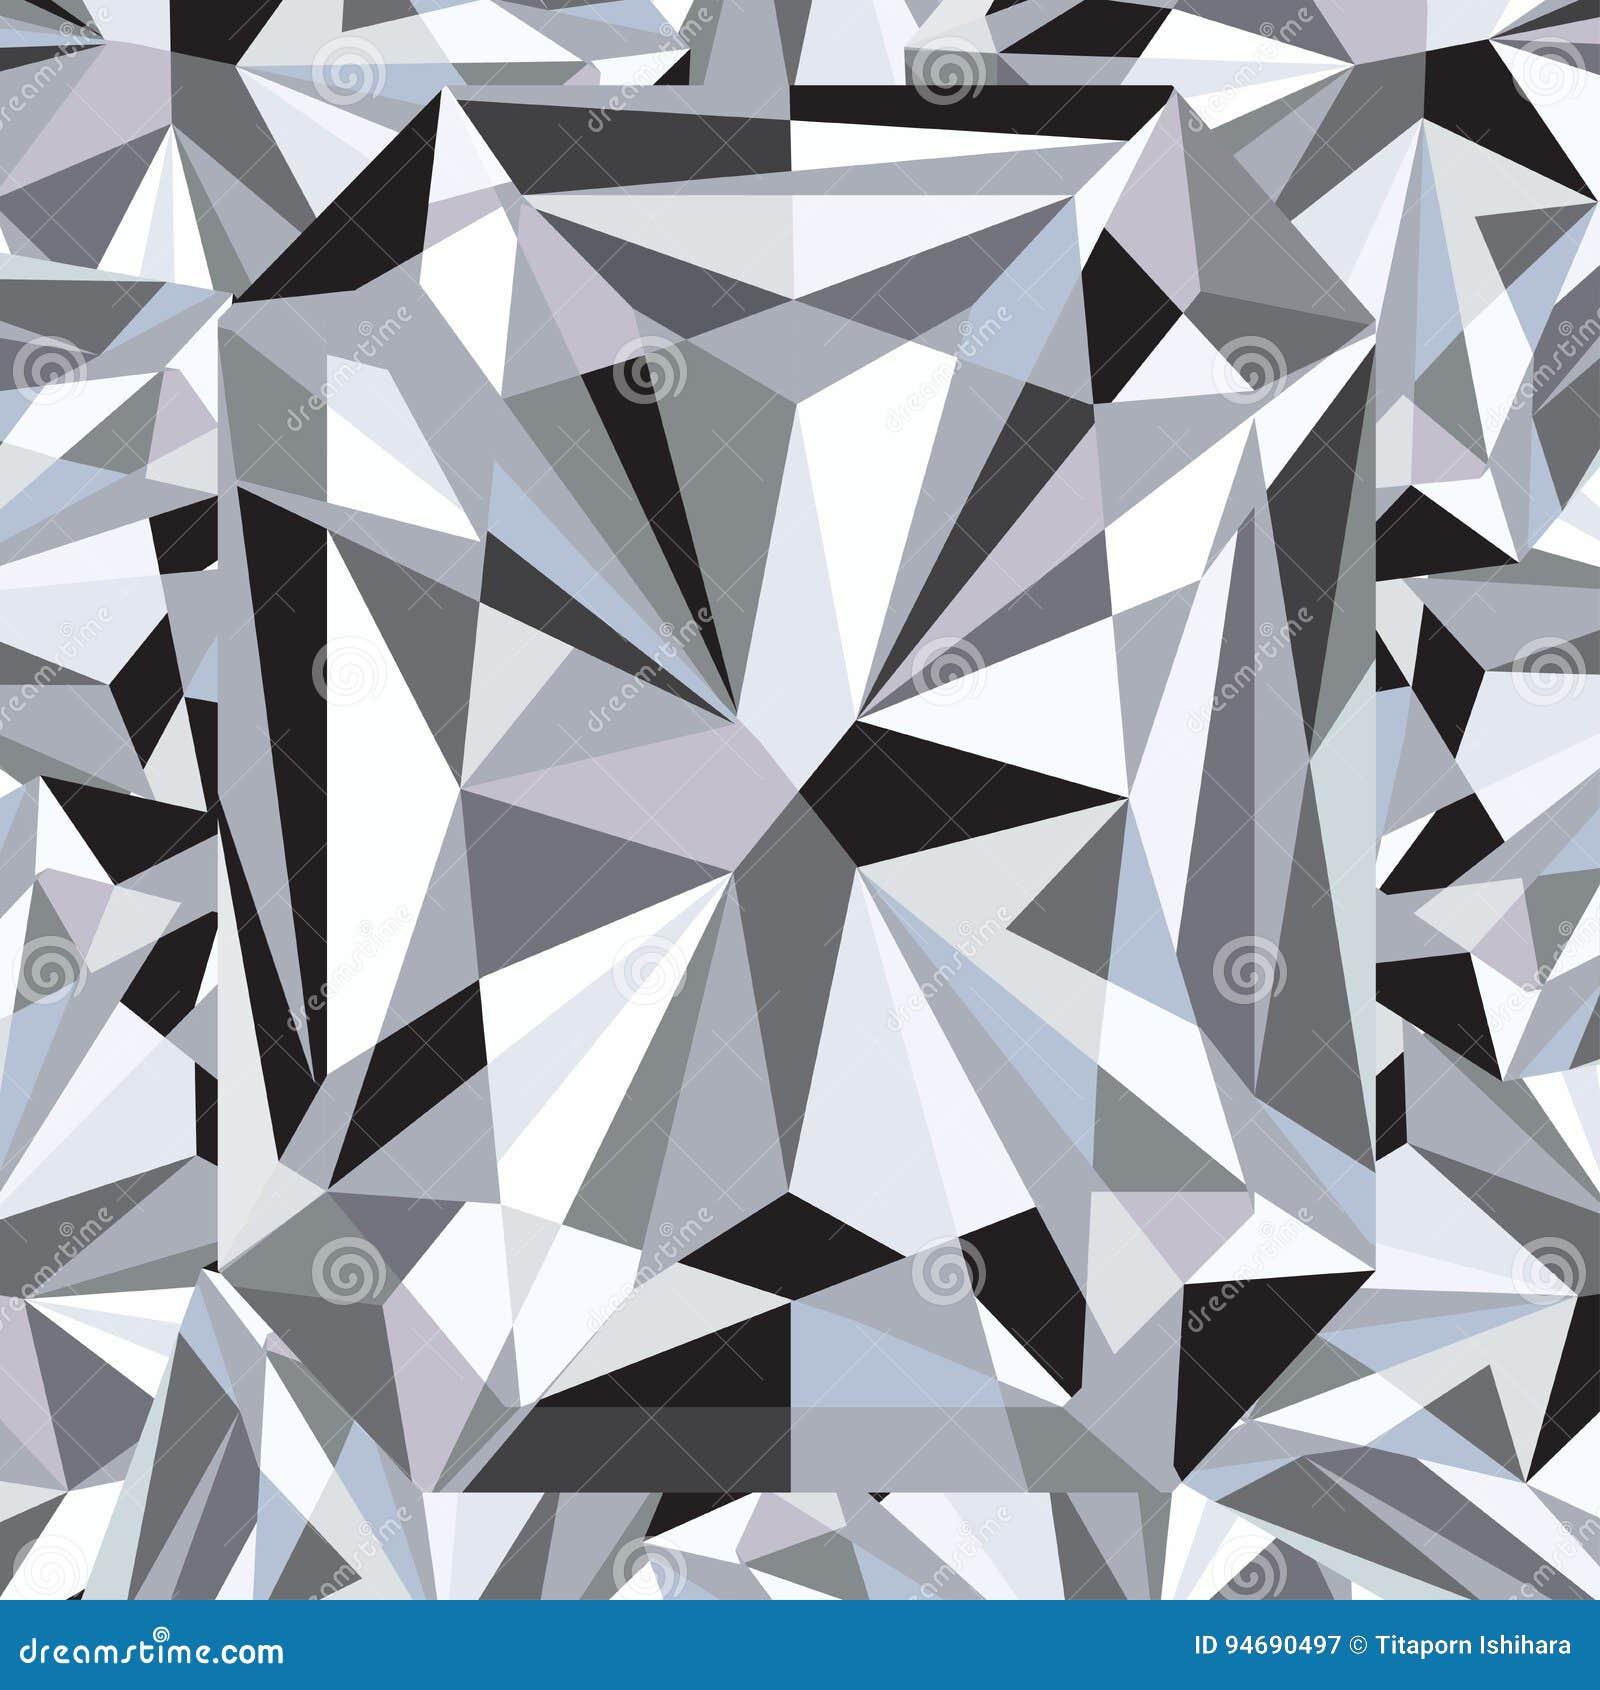 Diamond Reflection Abstract Background Vector Stock Vector